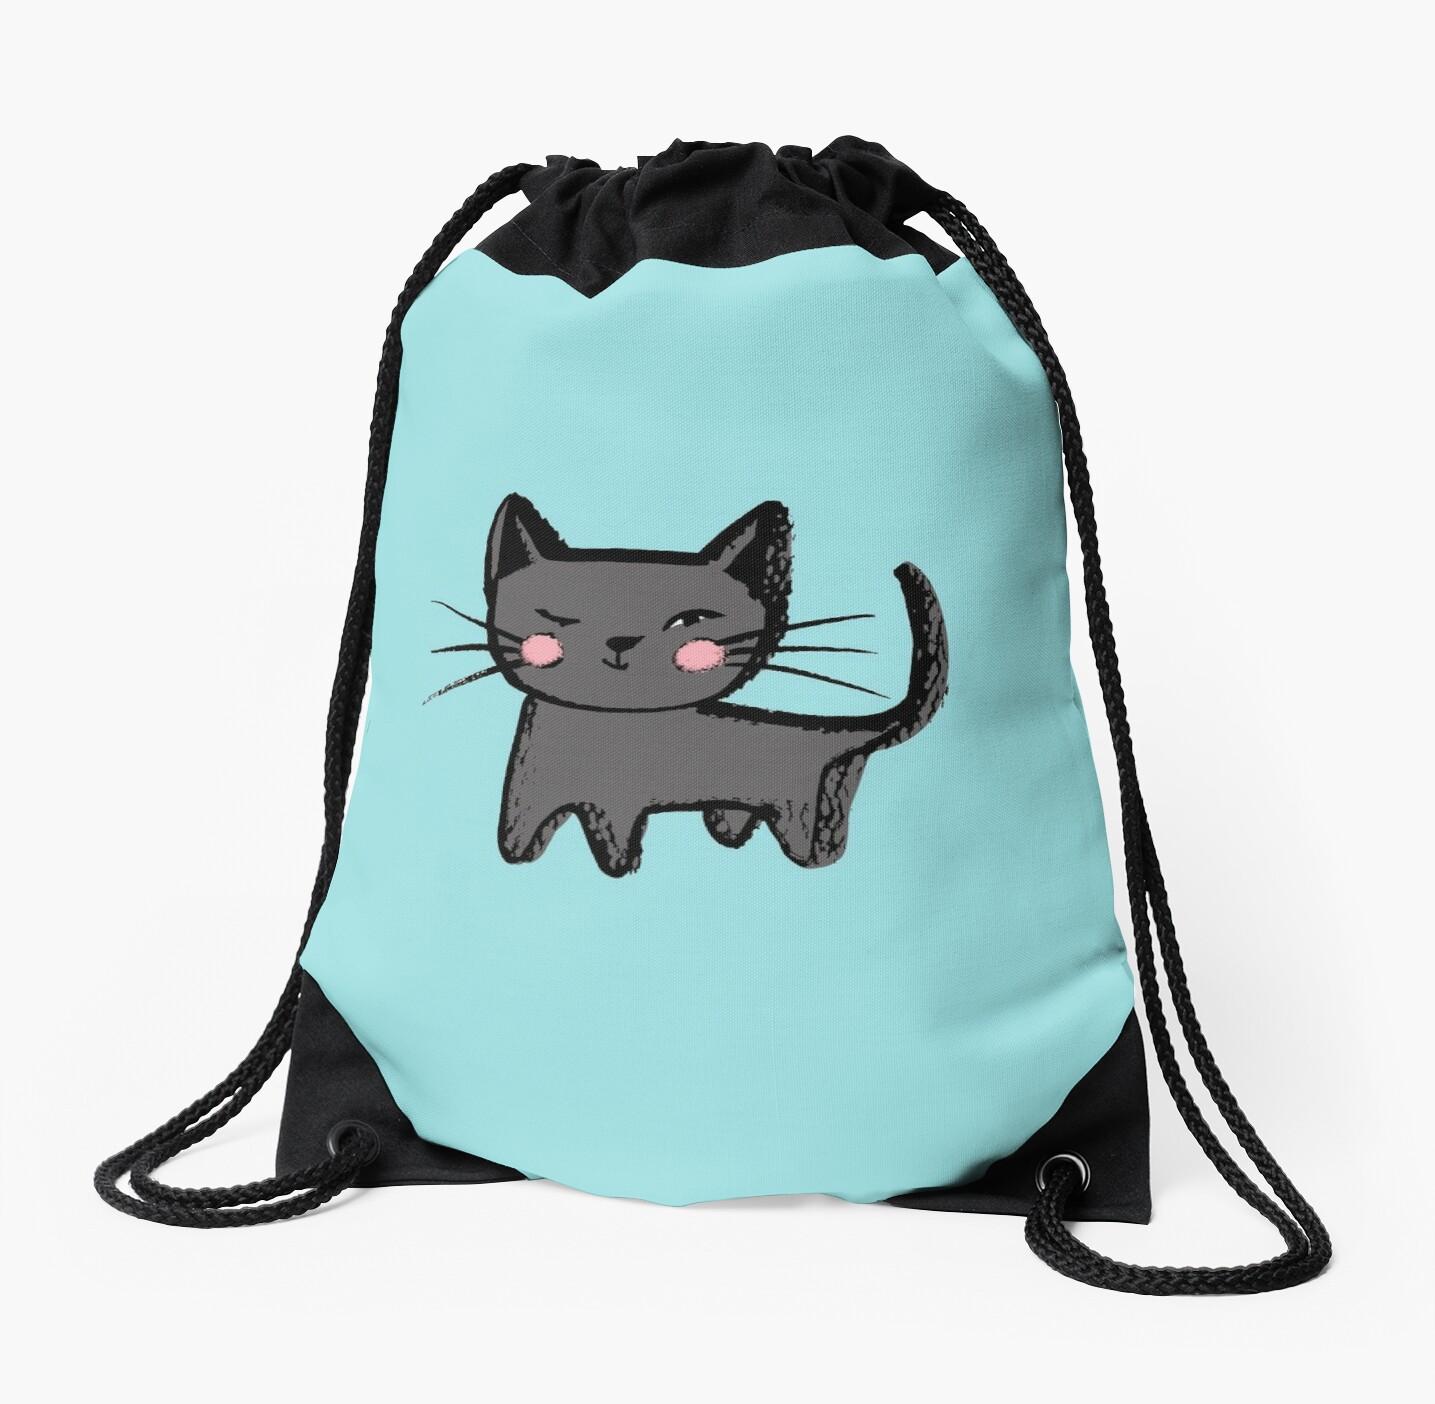 Kitty Wink Print Design Backpack